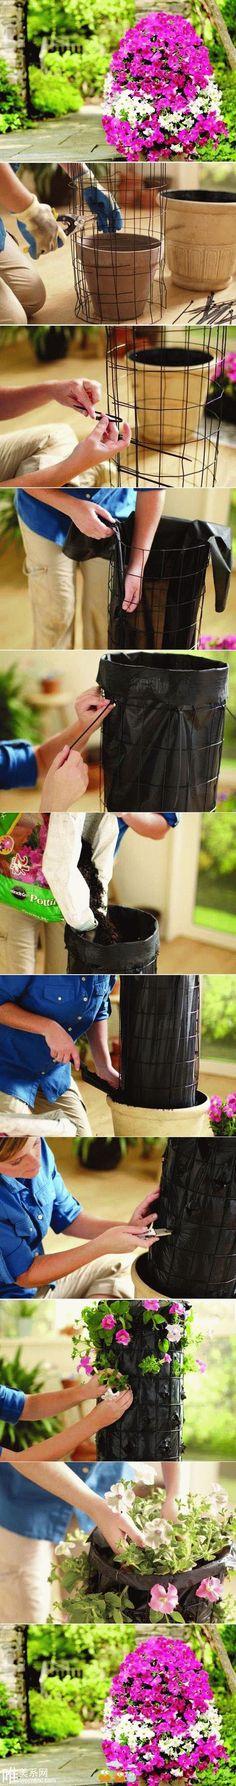 DIY Egg Shaped Flower Tower